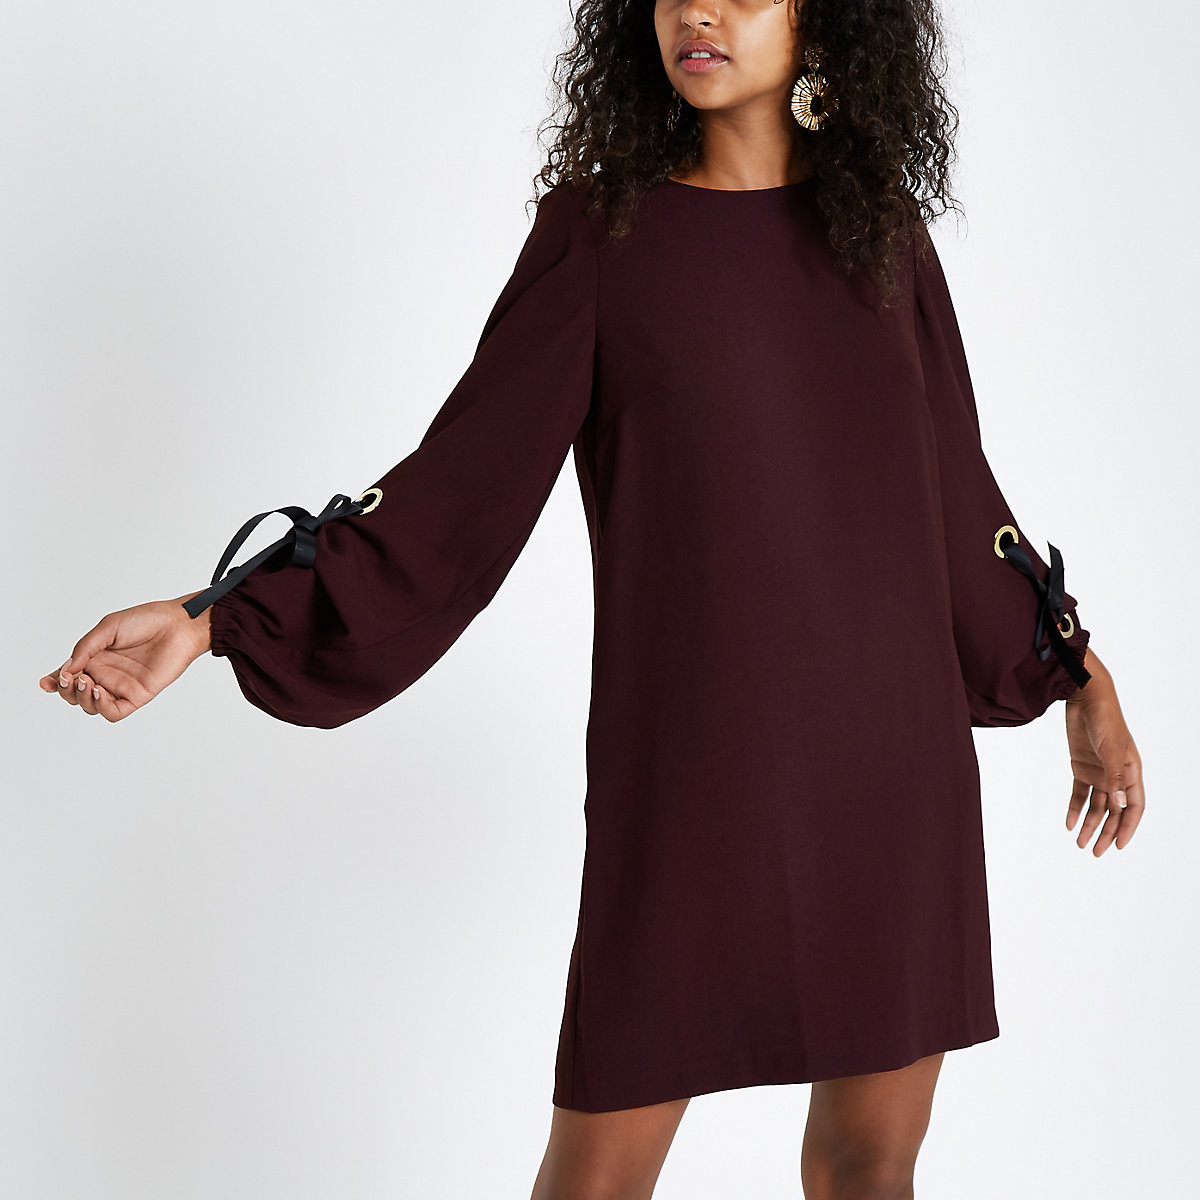 Dark red long sleeve swing dress